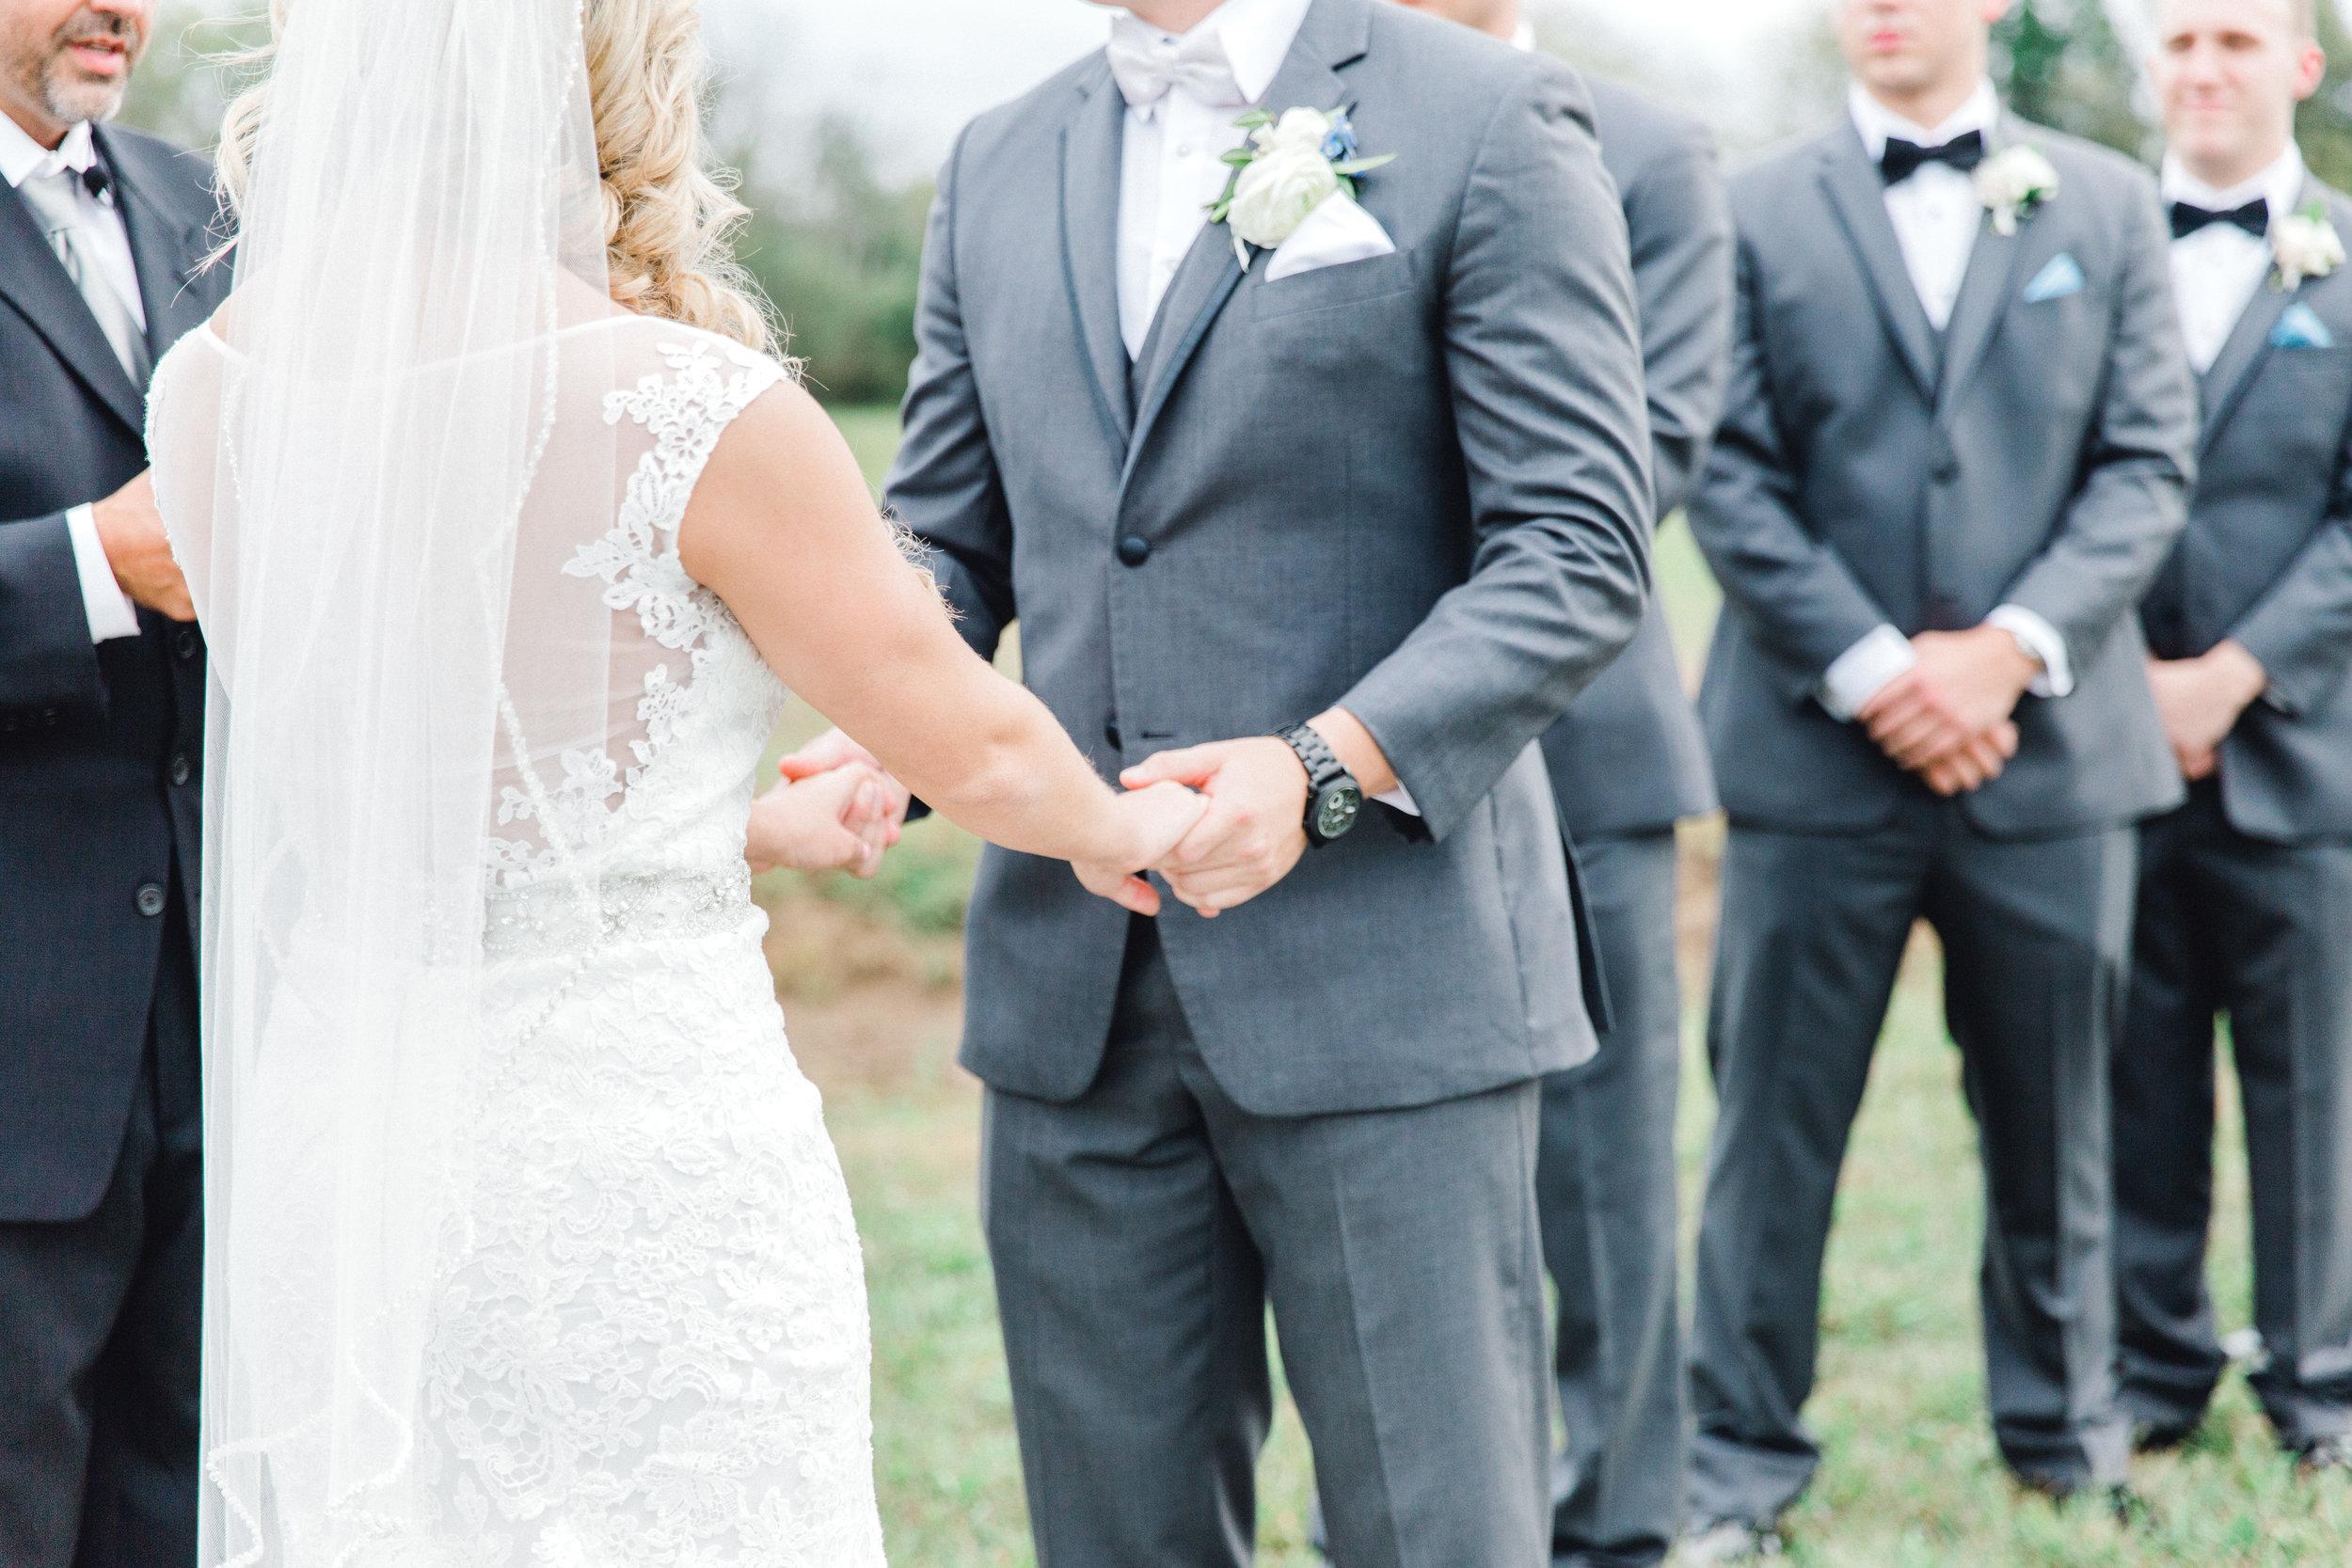 Paige-Mercer-Photography-Florida-Wedding-Photographer-Alyssa&Drew-49.jpg